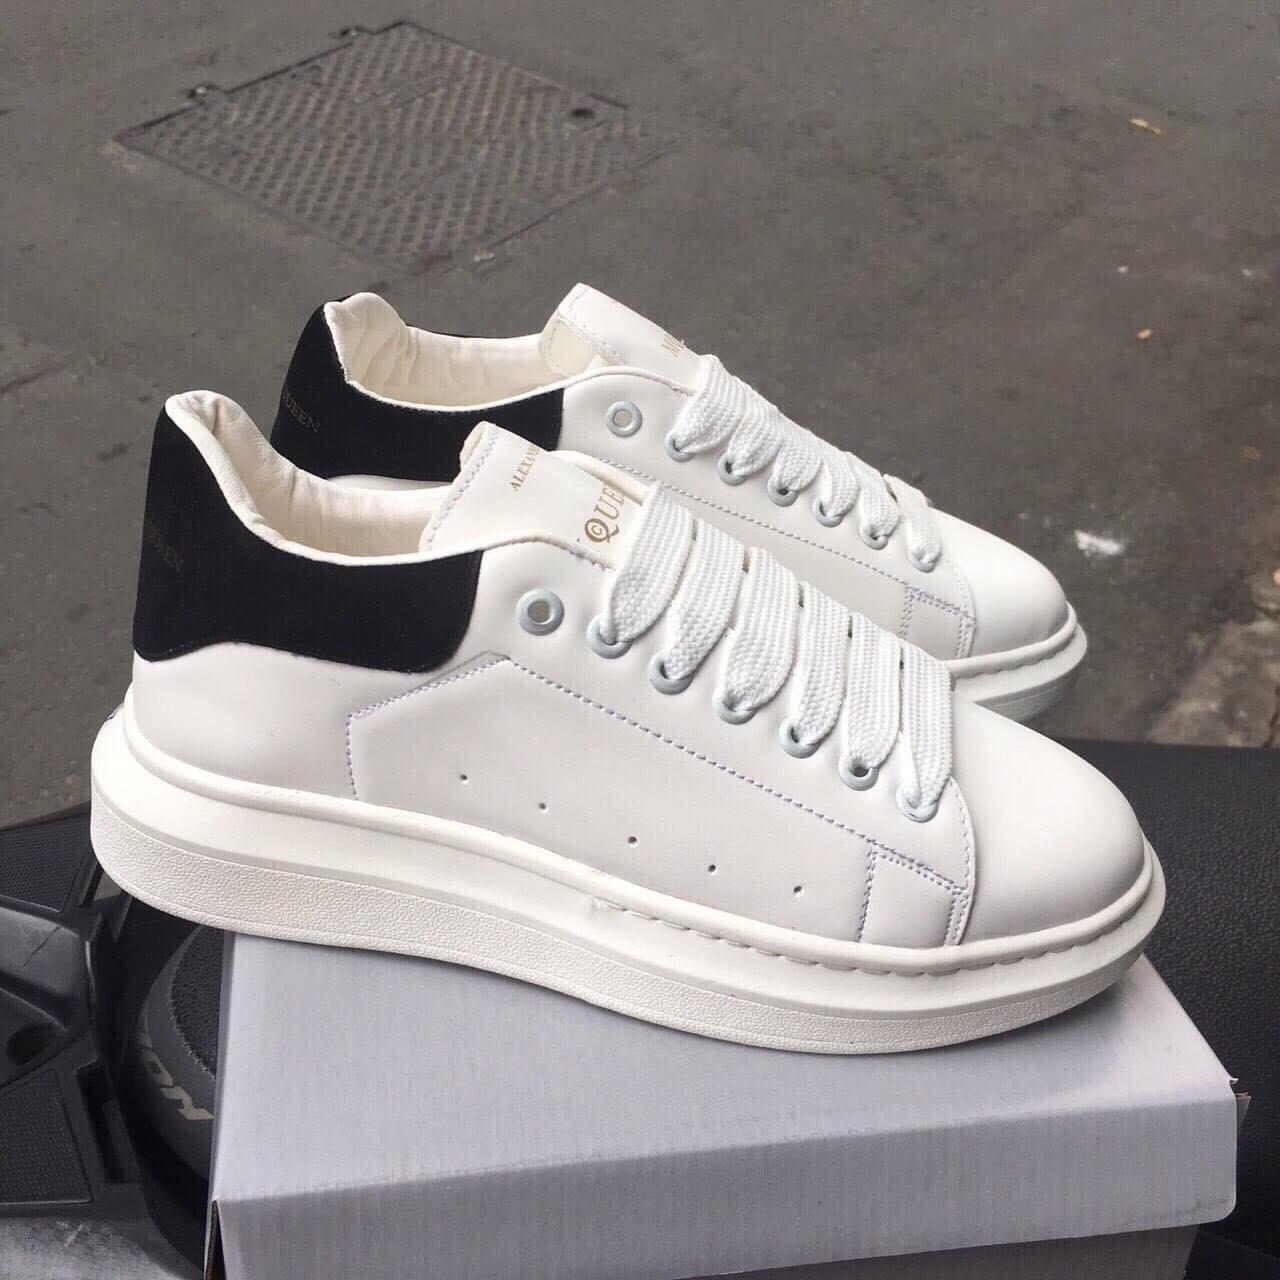 giày mc queen đen trắng